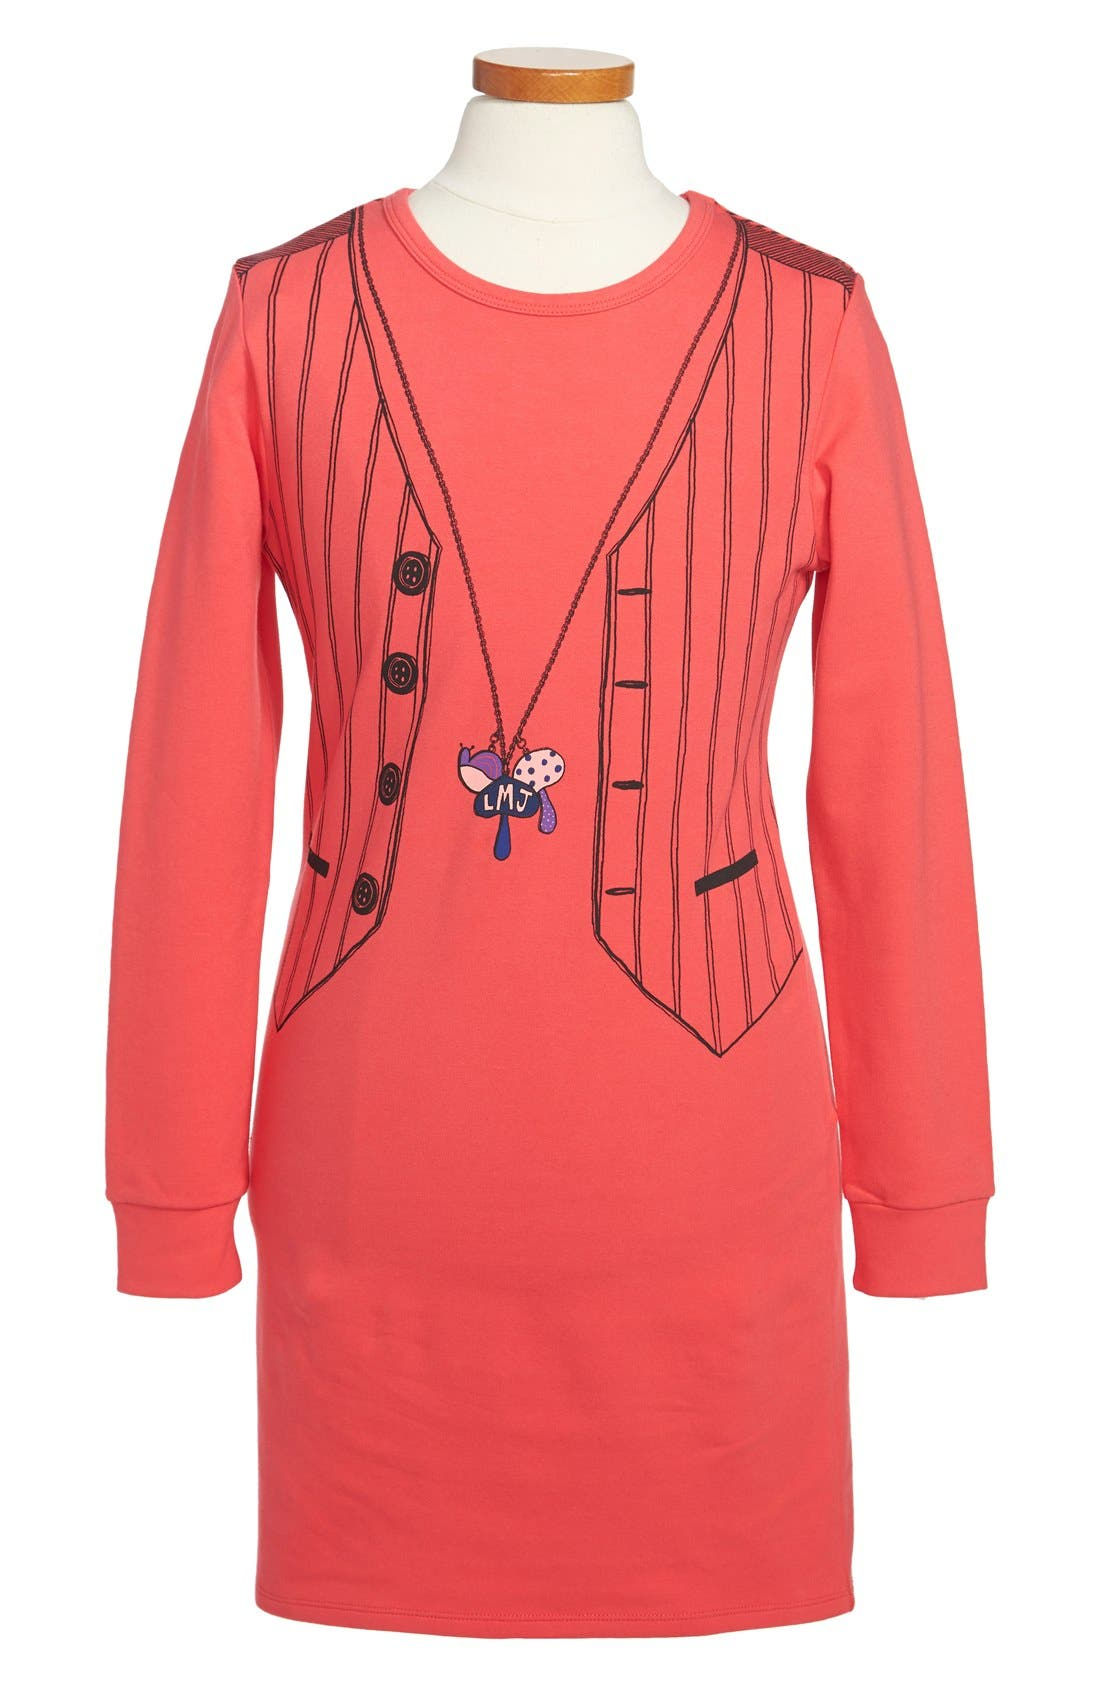 Main Image - LITTLE MARC JACOBS 'Tromp l'Oeil' Dress (Toddler Girls, Little Girls & Big Girls)